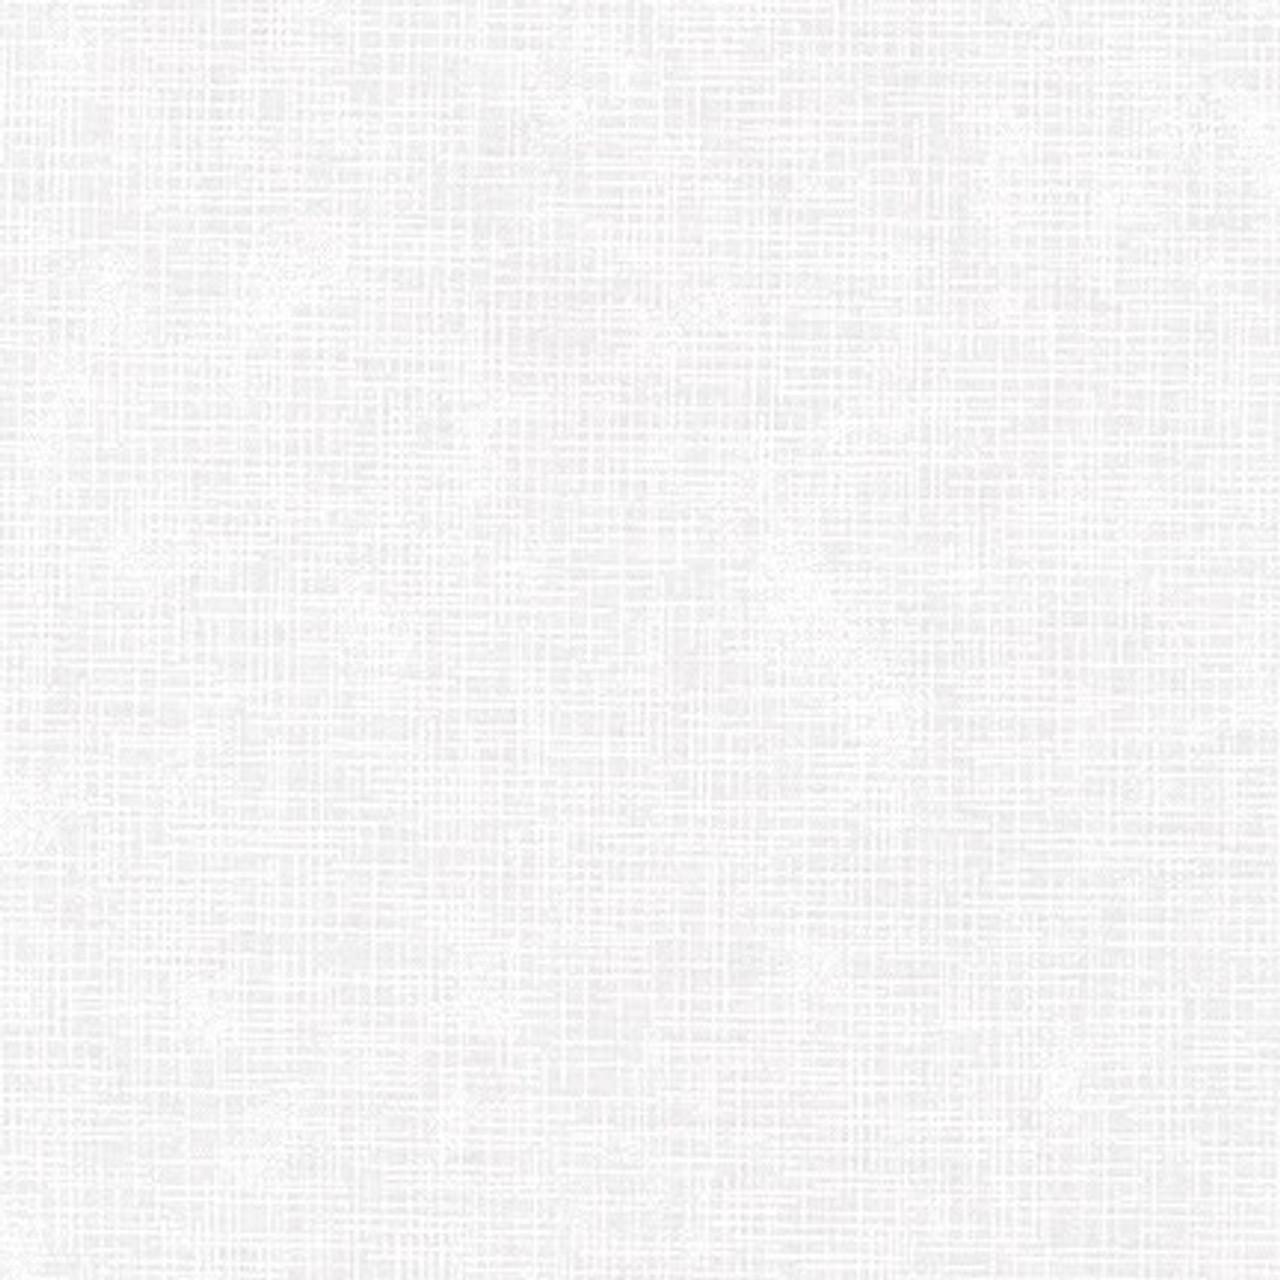 100% Cotton linen look - White